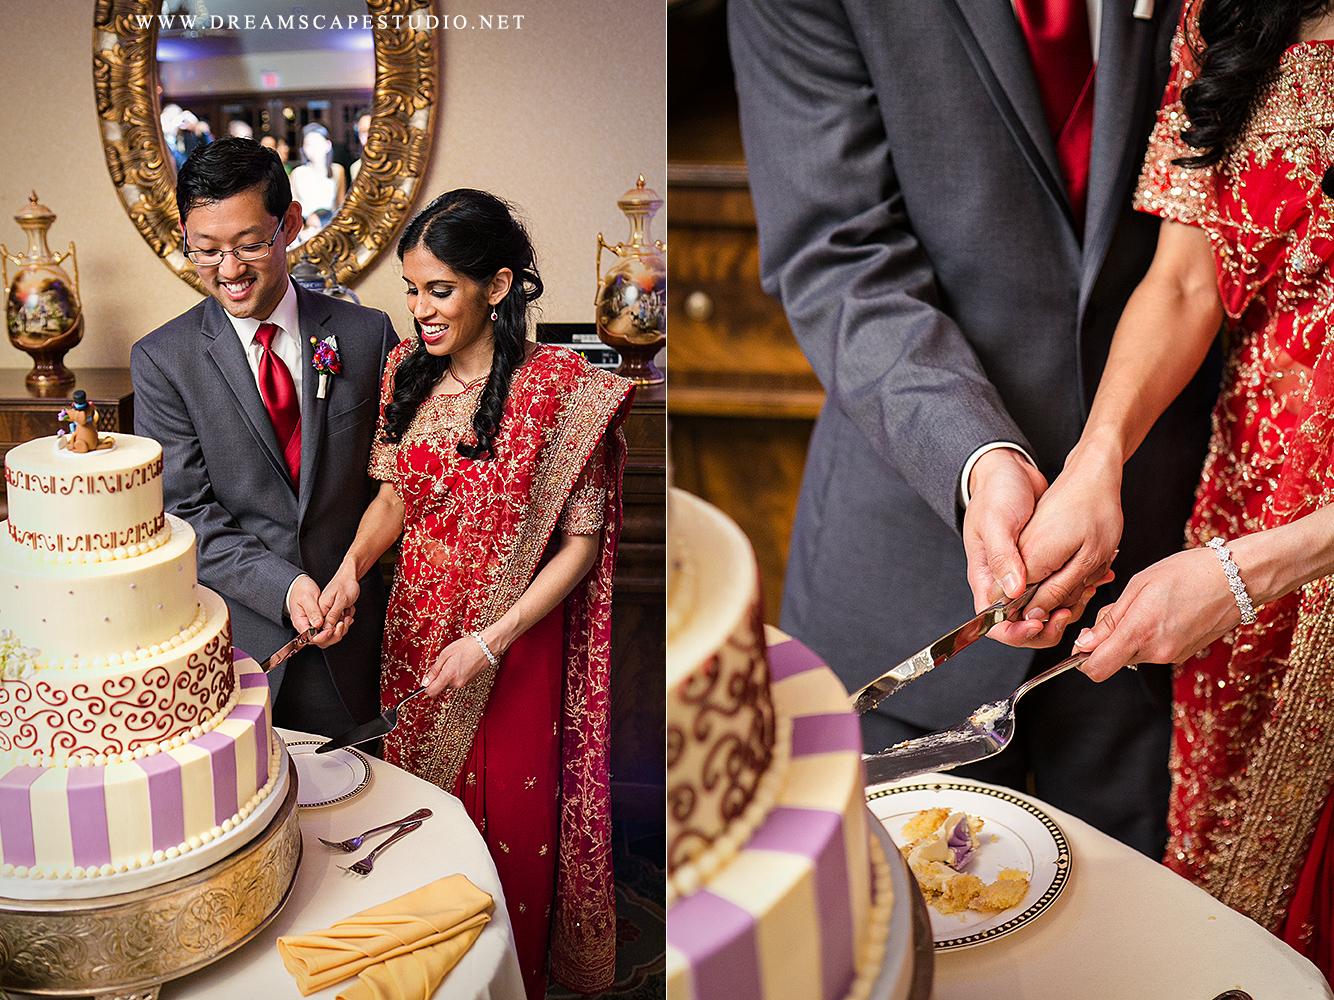 CT_Wedding_Photographer_PaHe_Blog_39.jpg